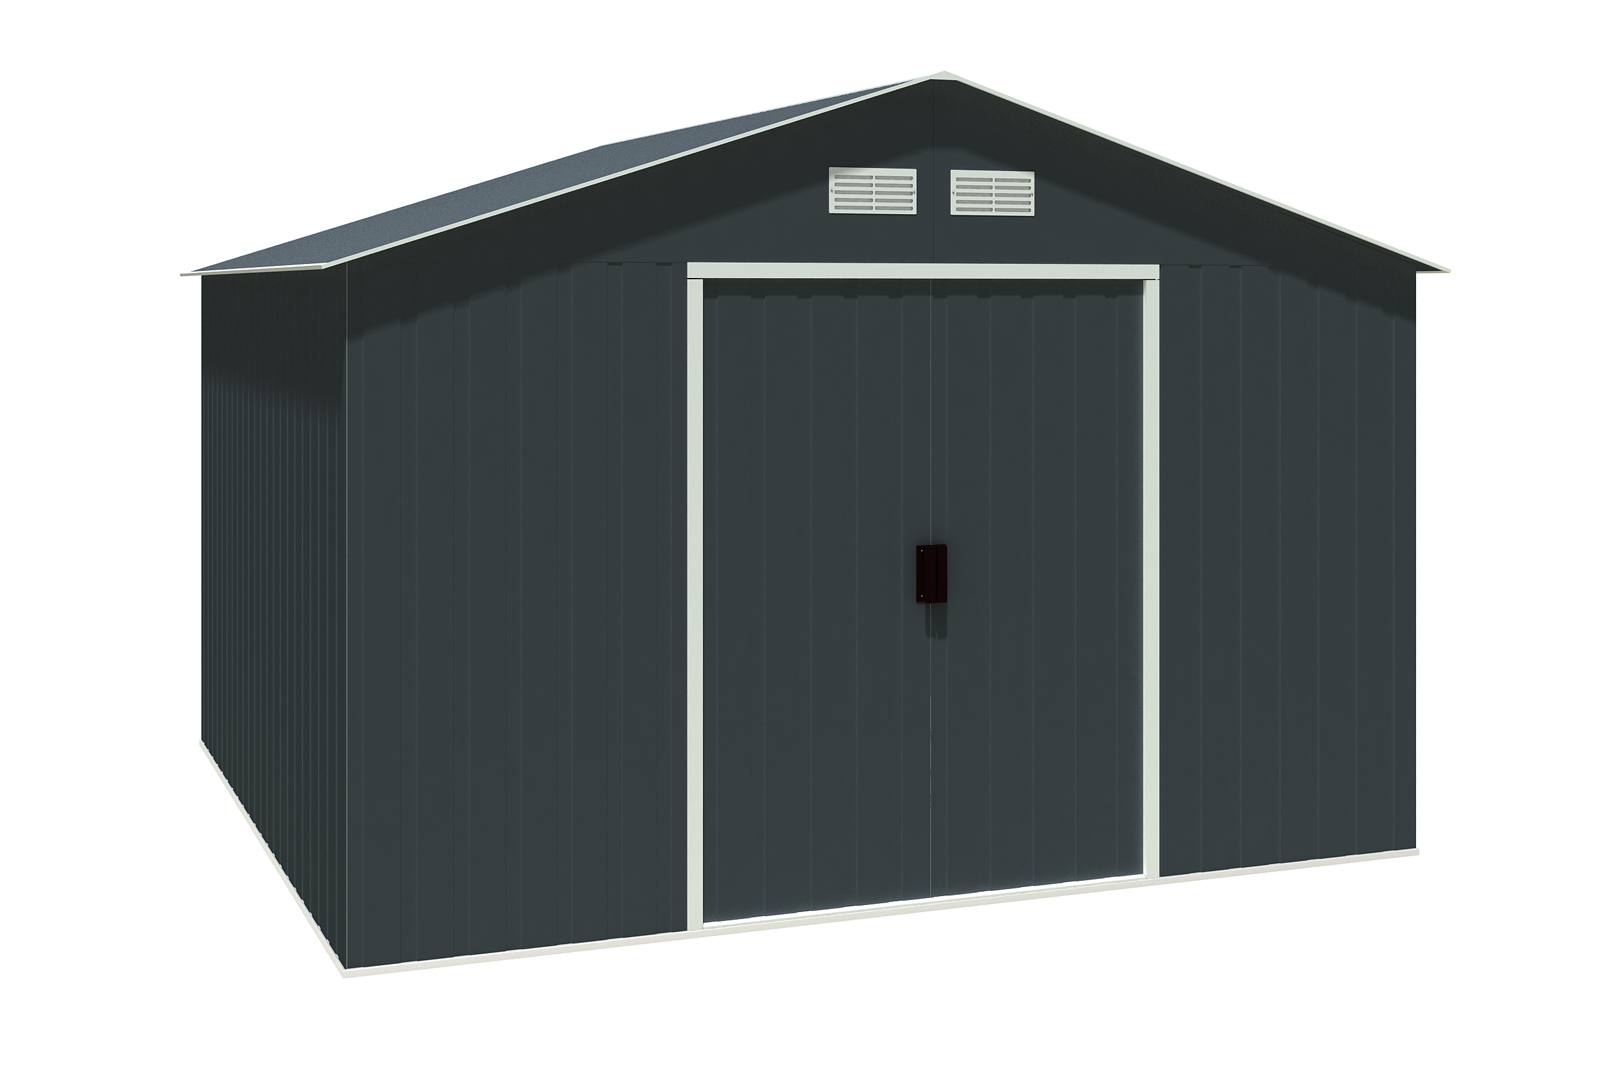 metallger tehaus colossus 10x10 anthrazit 7247. Black Bedroom Furniture Sets. Home Design Ideas